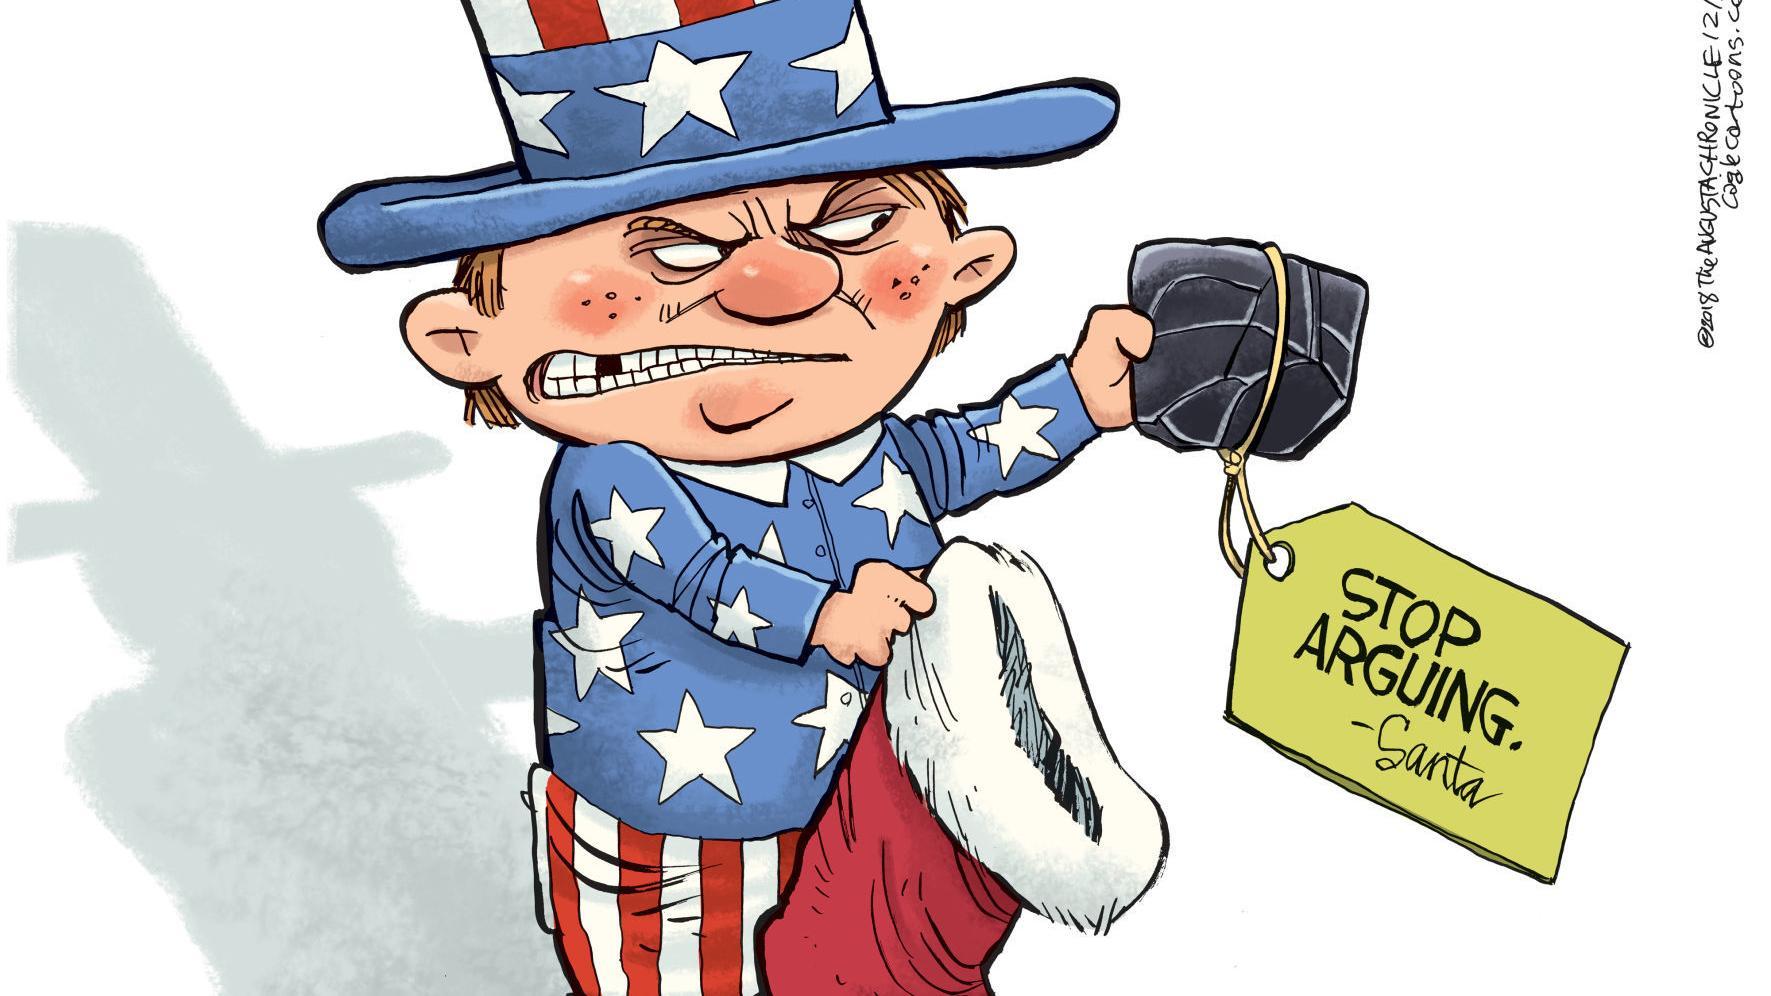 Santa offers America some advice, in Rick McKee's latest political cartoon